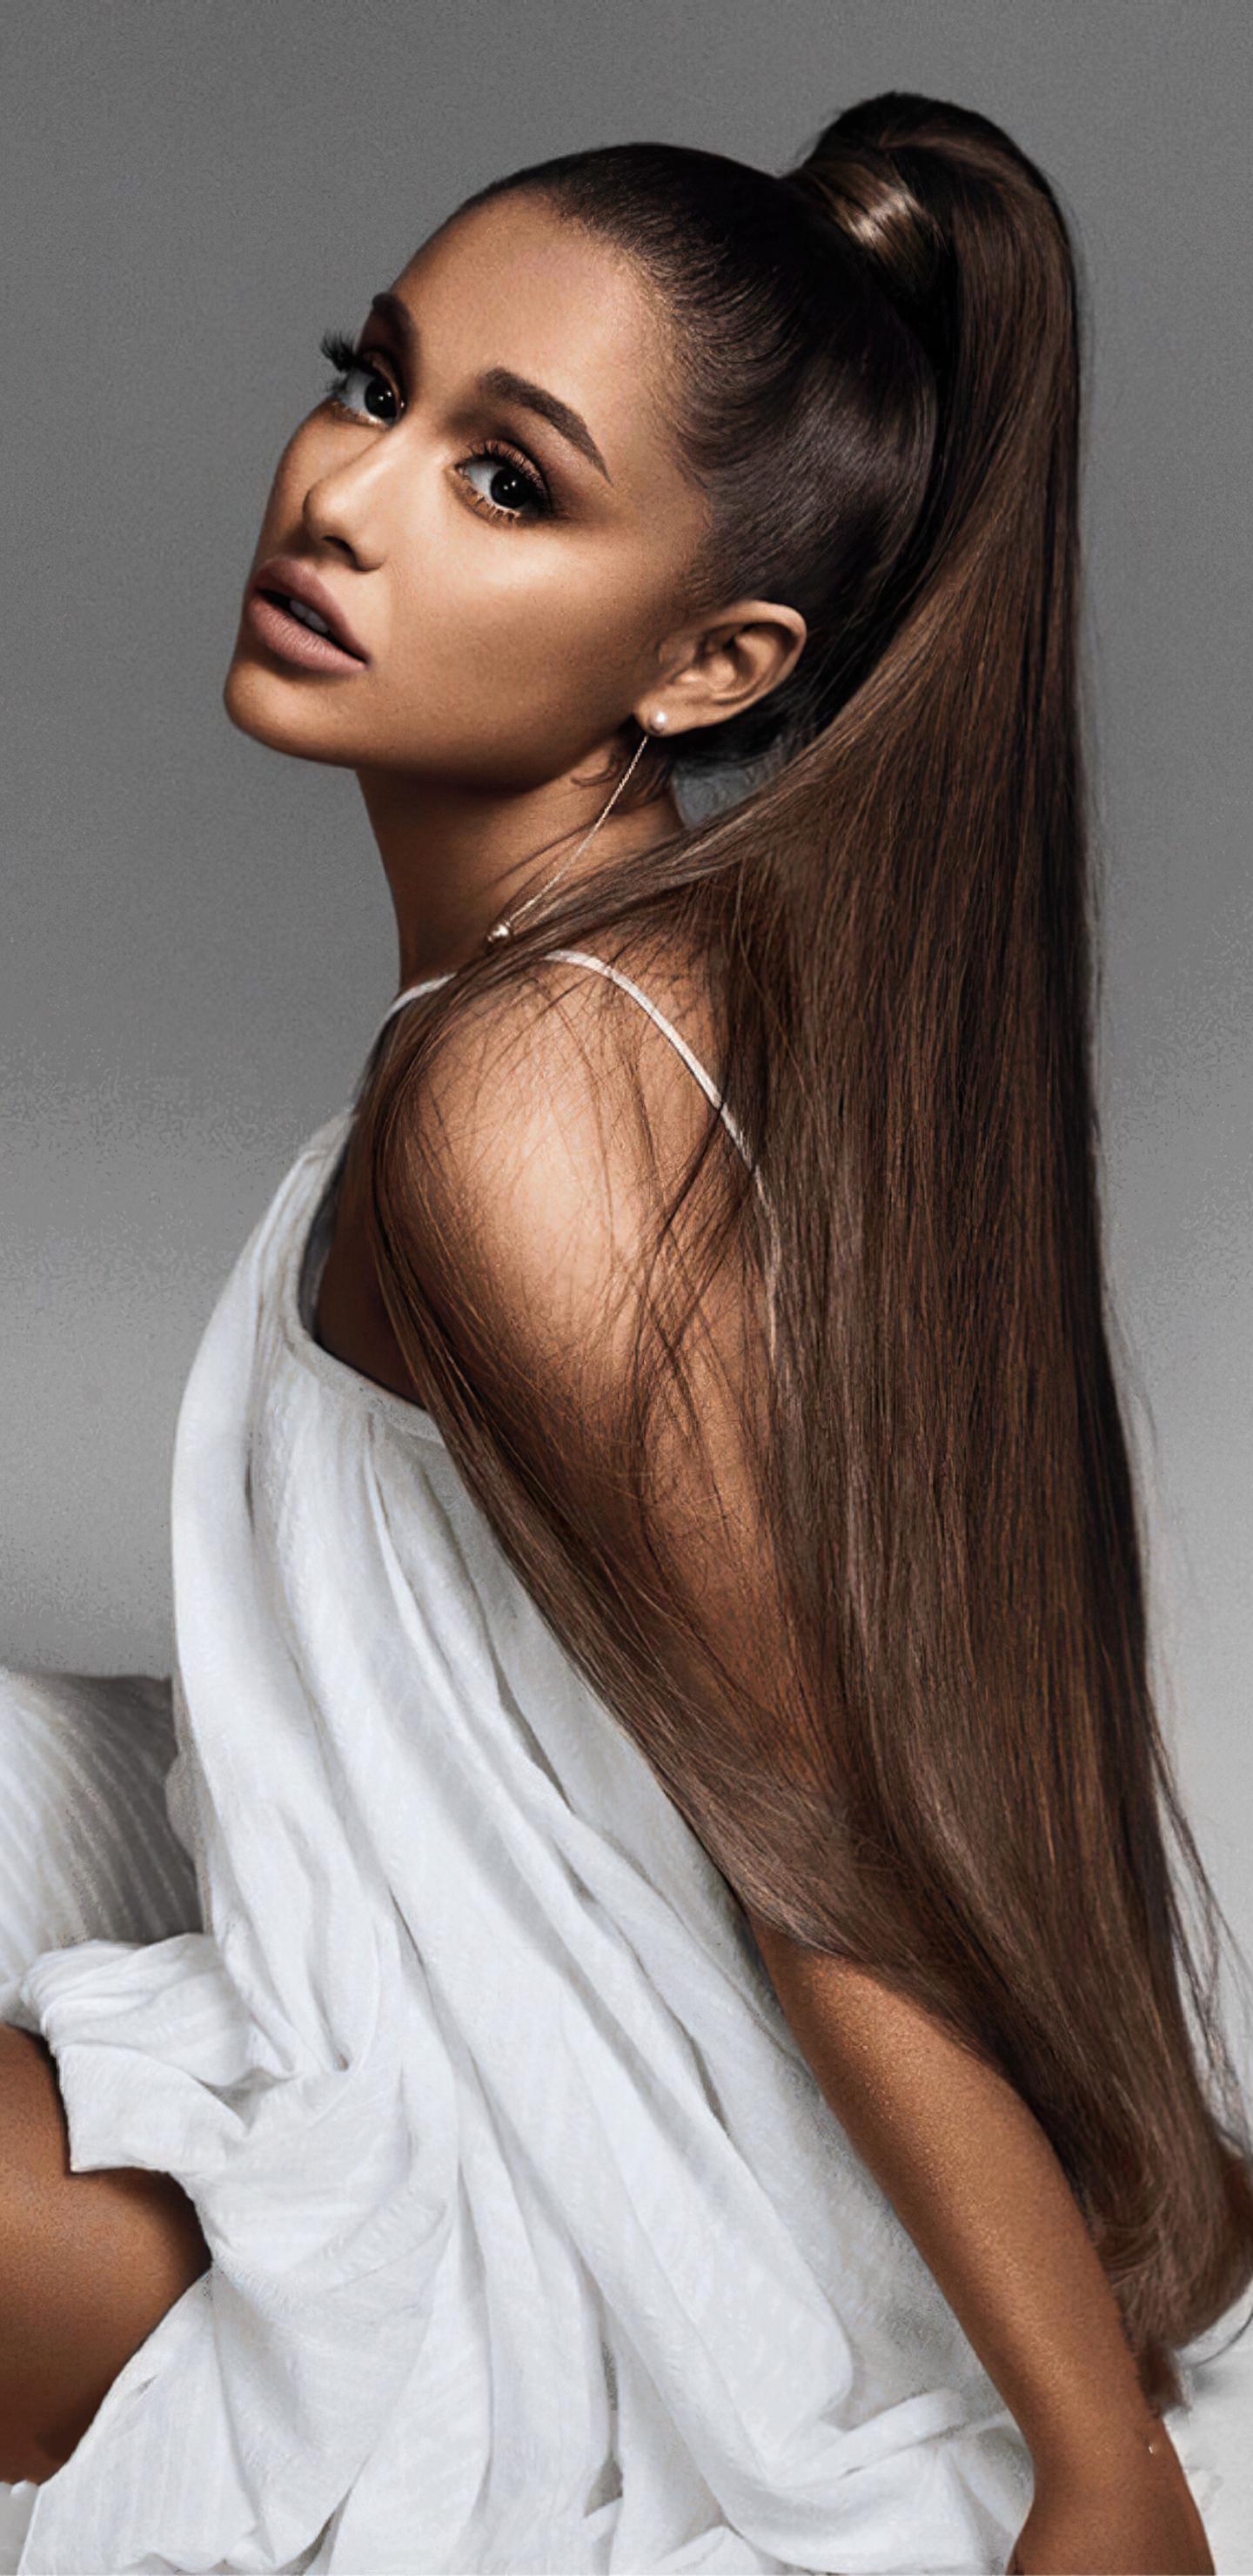 1440x2960 Ariana Grande 2020 Samsung Galaxy Note 9,8, S9 ...